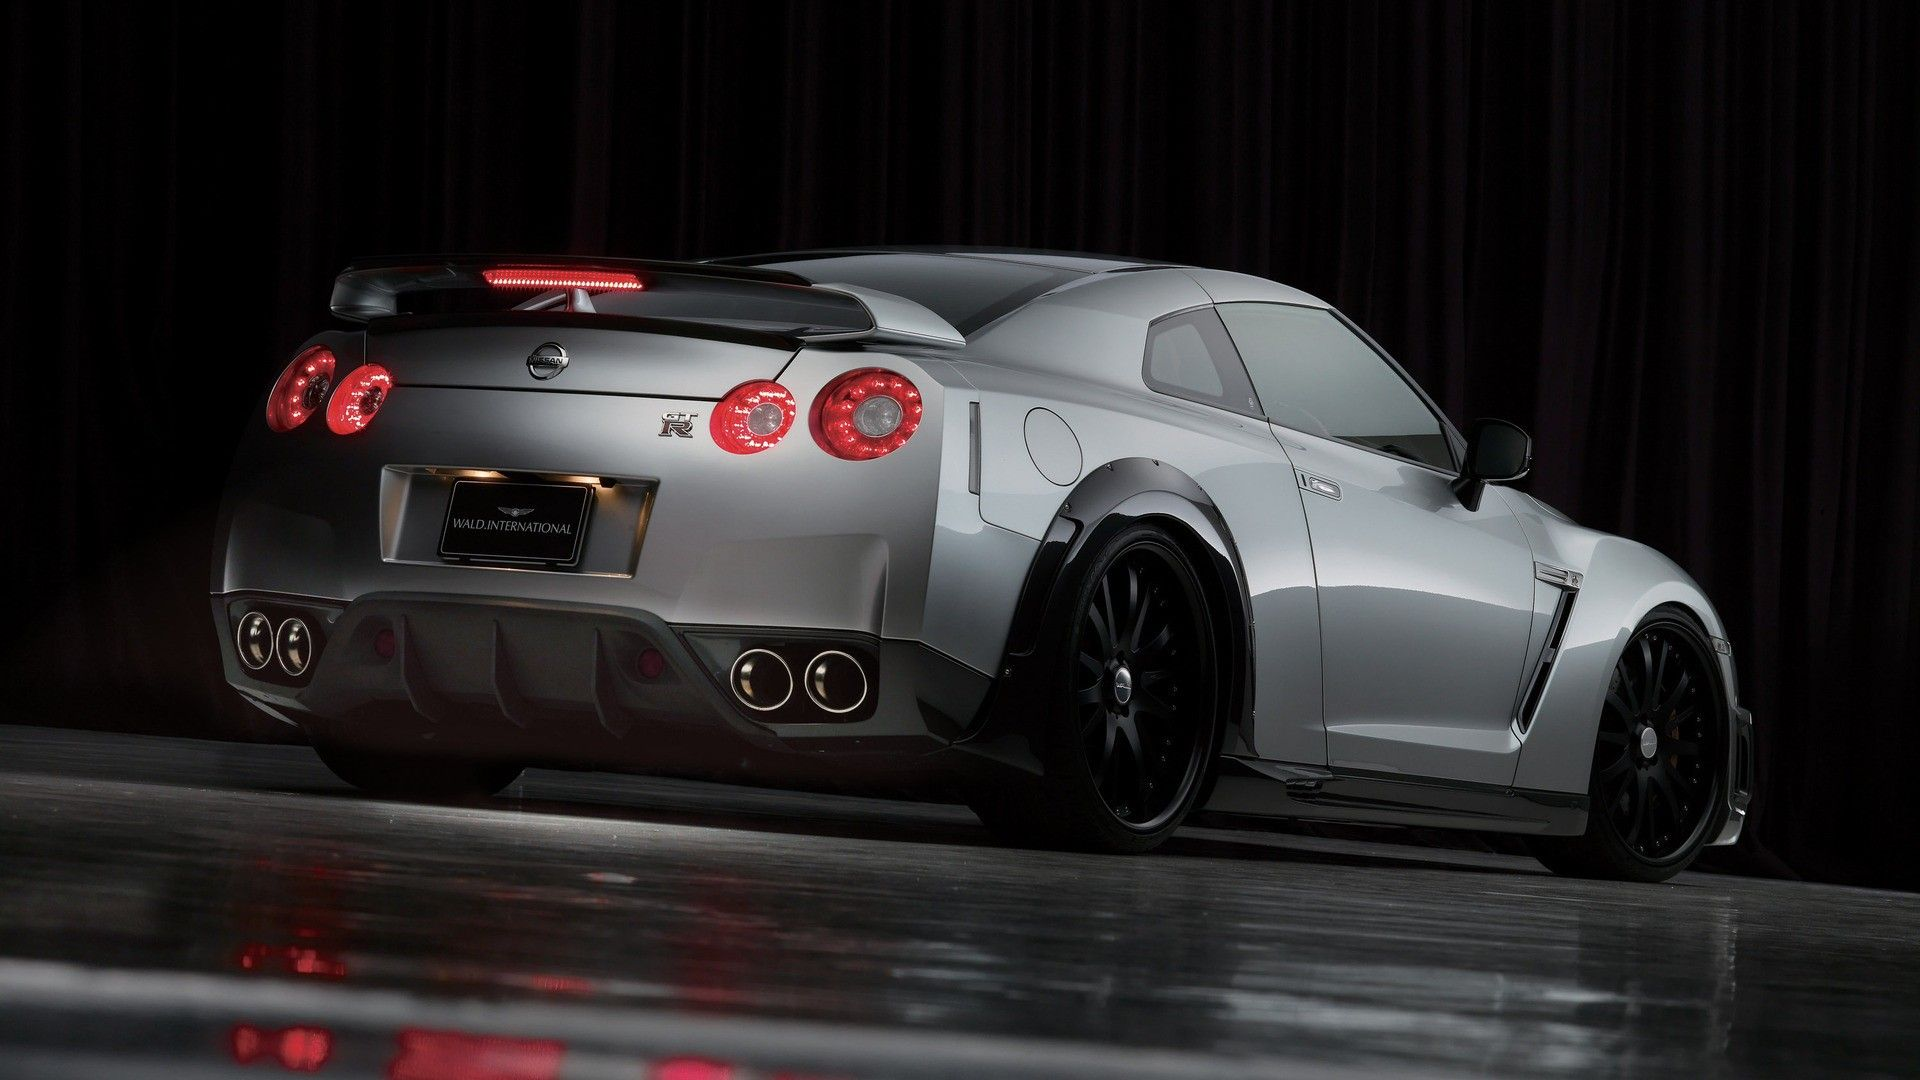 Luxury Nissan Gtr Wallpaper Hd 1920x1080【2020】 スカイラインgt